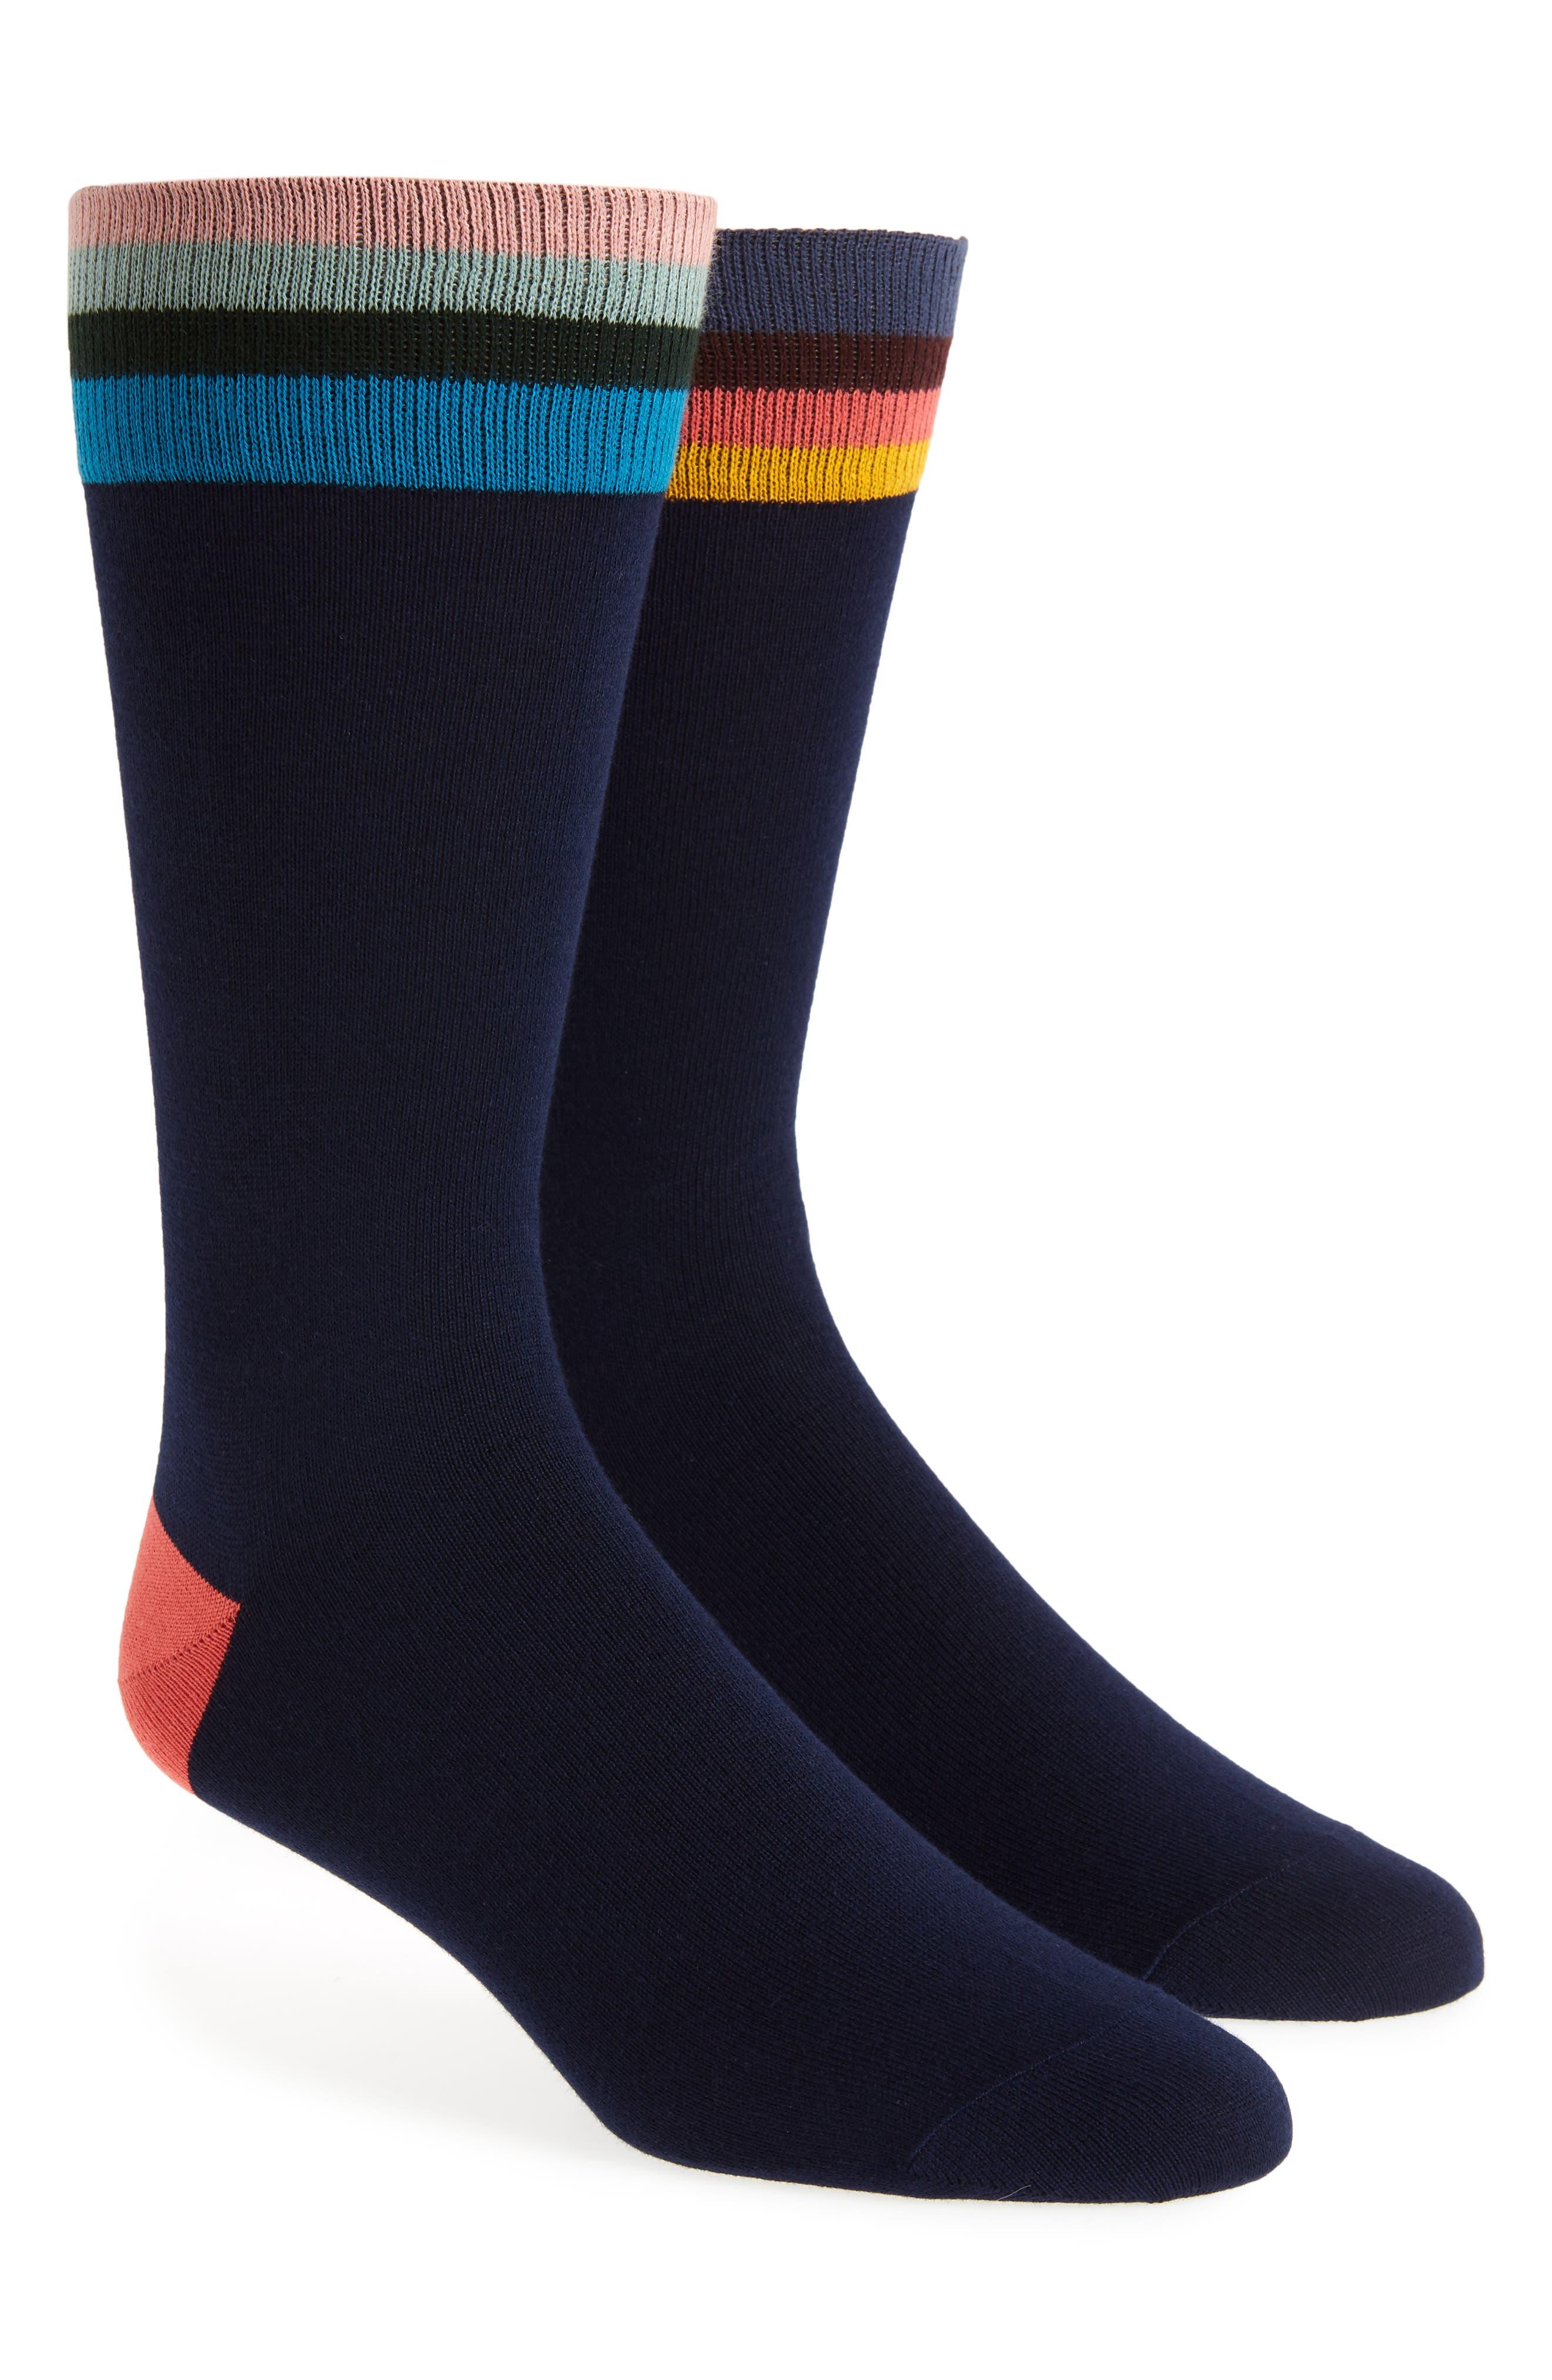 Mismatched Artist Top Socks,                             Main thumbnail 1, color,                             BLACK MULTI